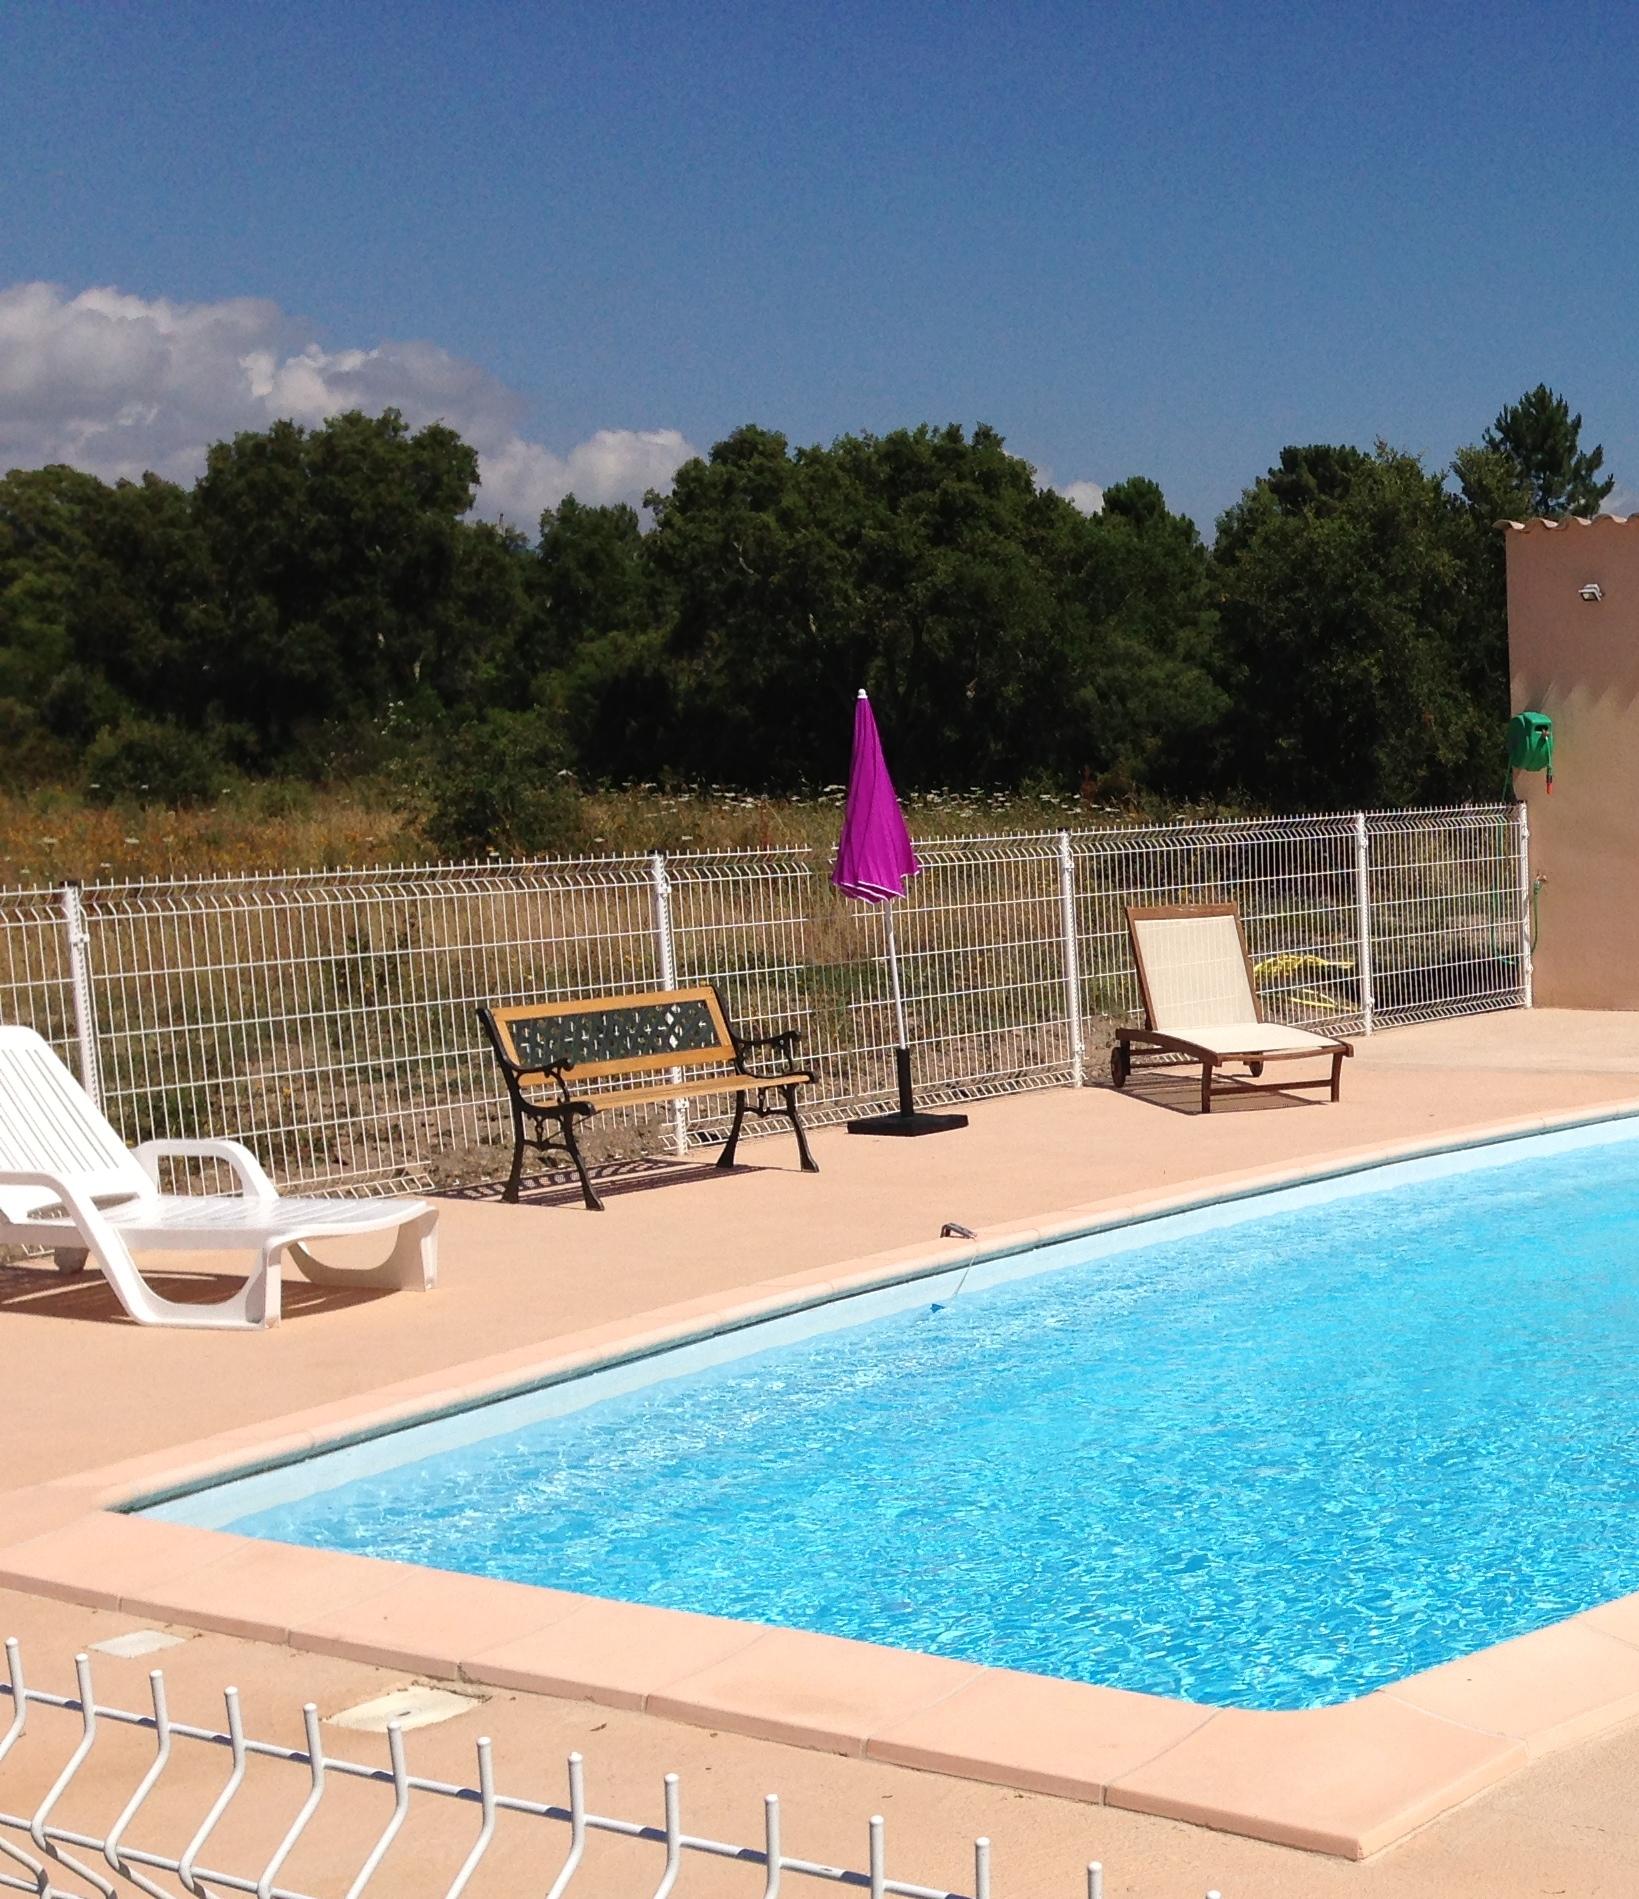 Corse location vacances, piscine